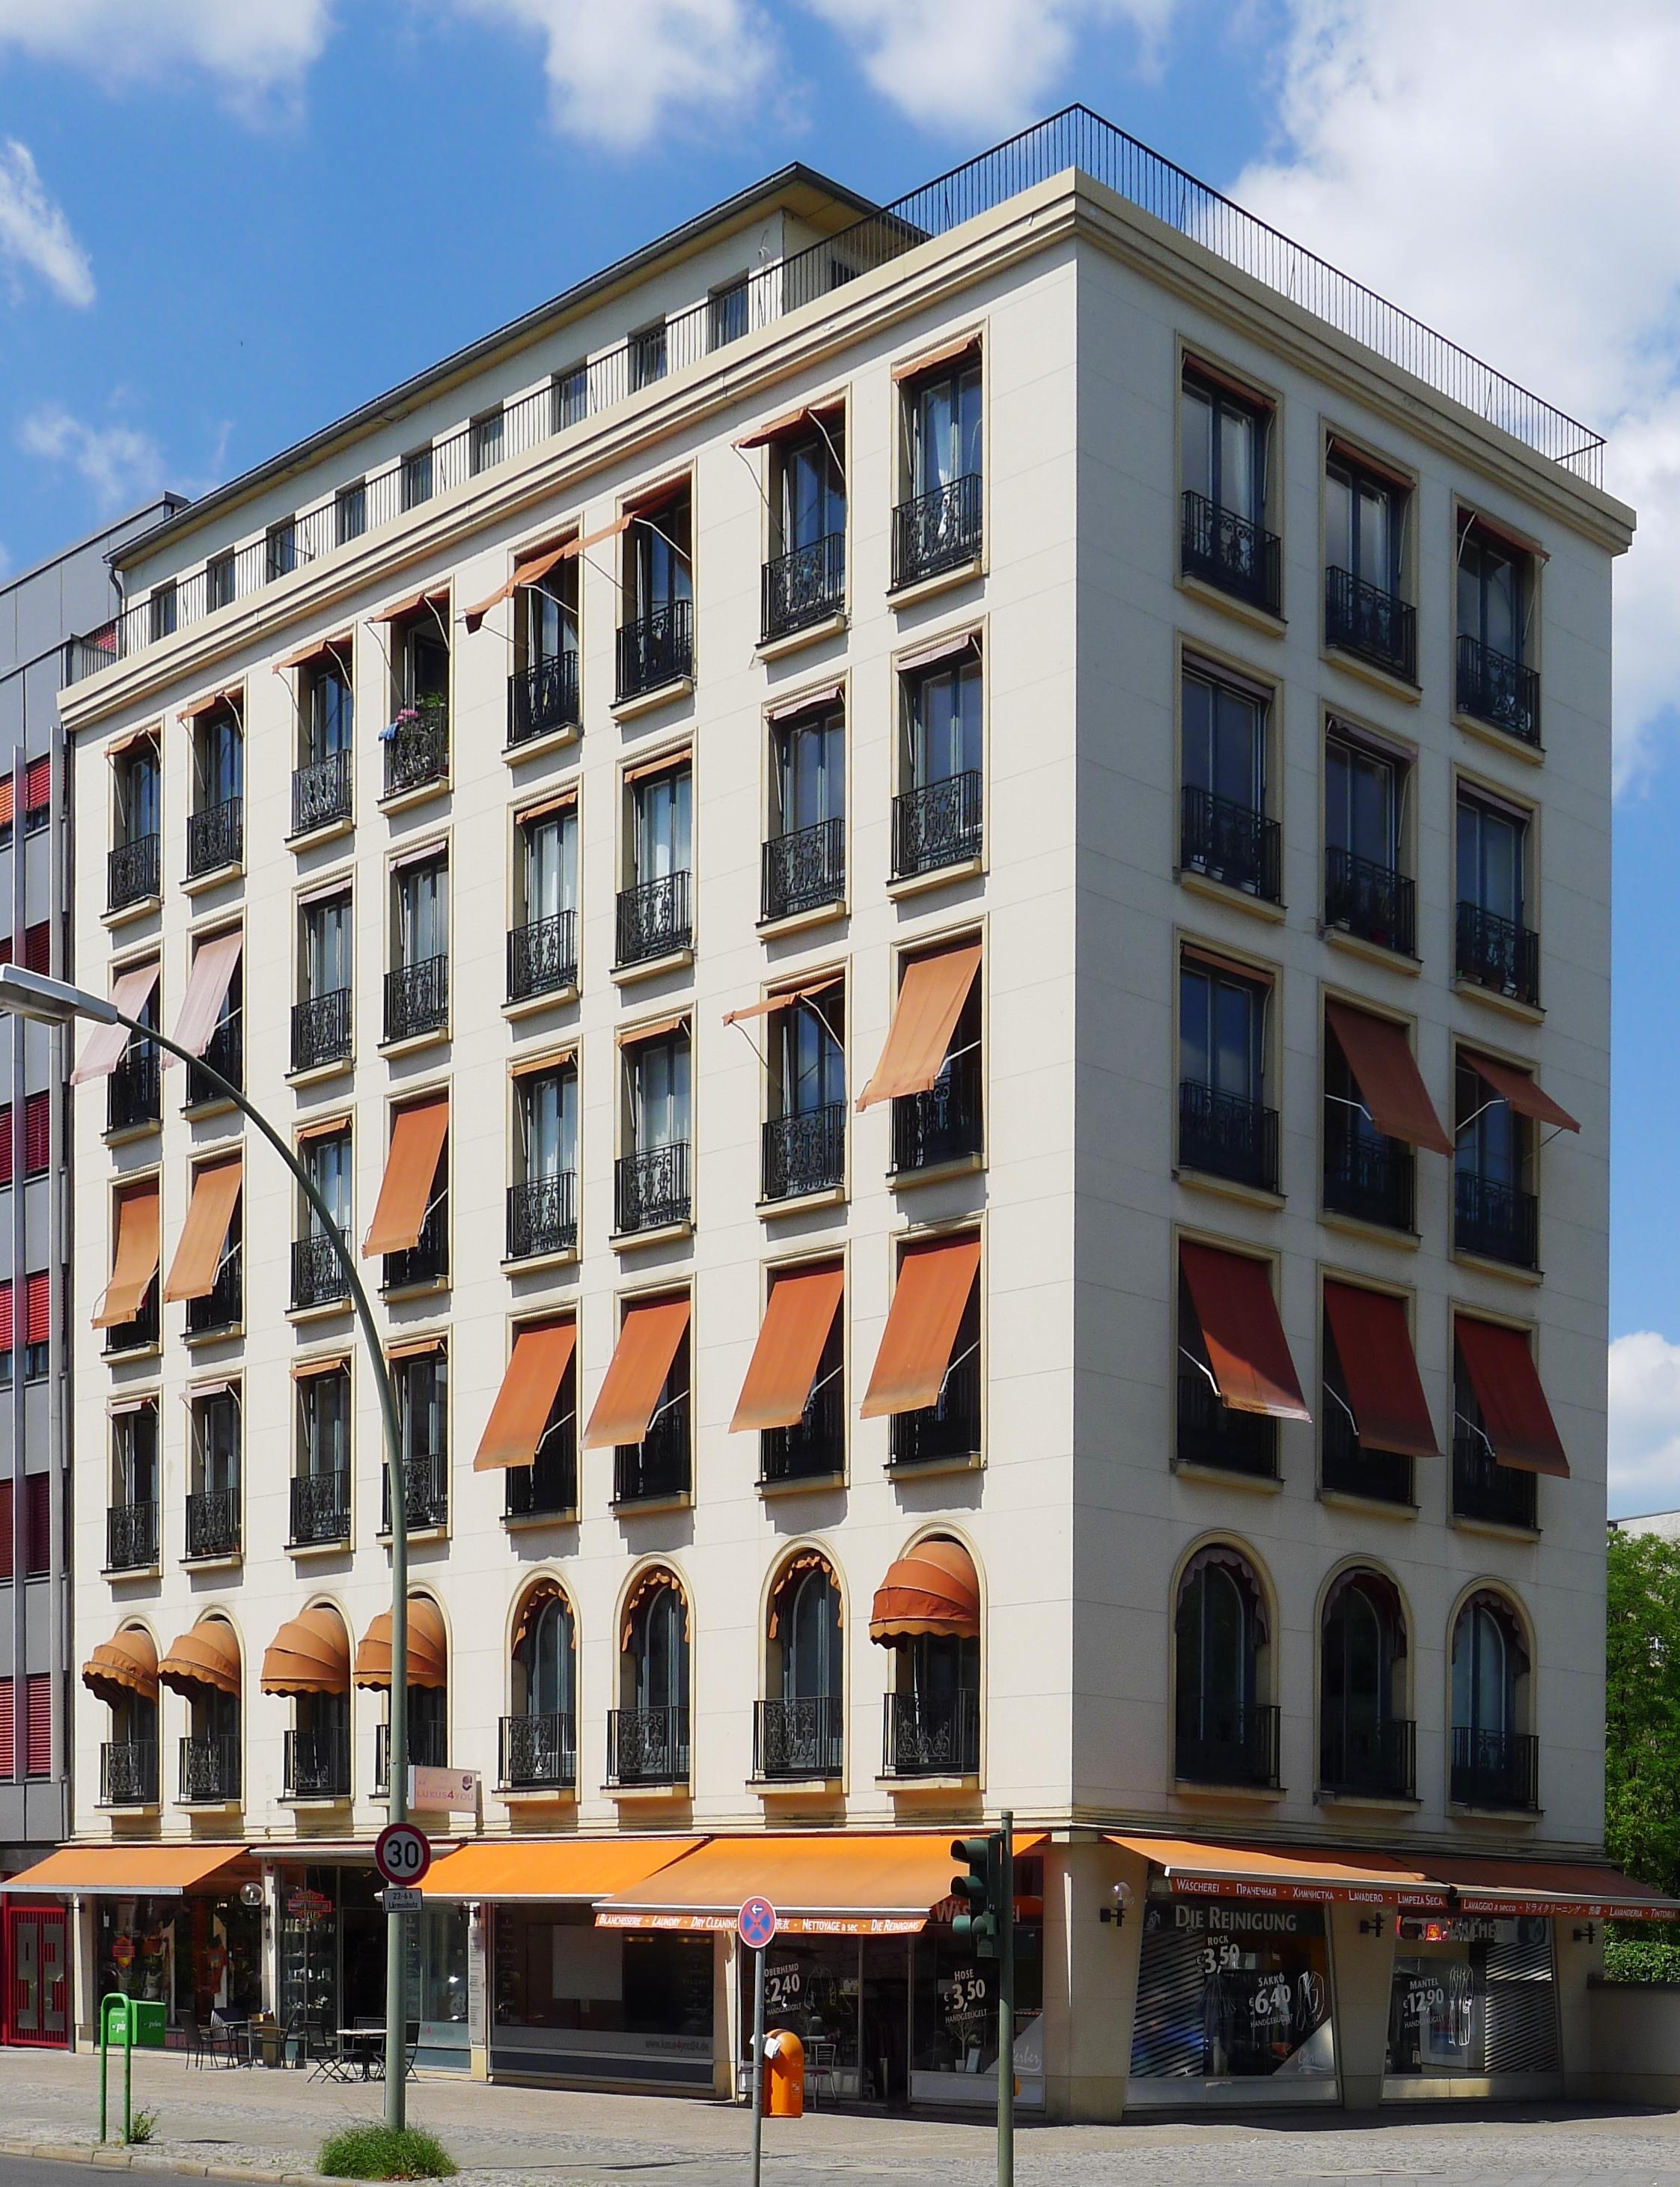 file lietzenburger stra e 90 berlin charlottenburg jpg wikimedia commons. Black Bedroom Furniture Sets. Home Design Ideas